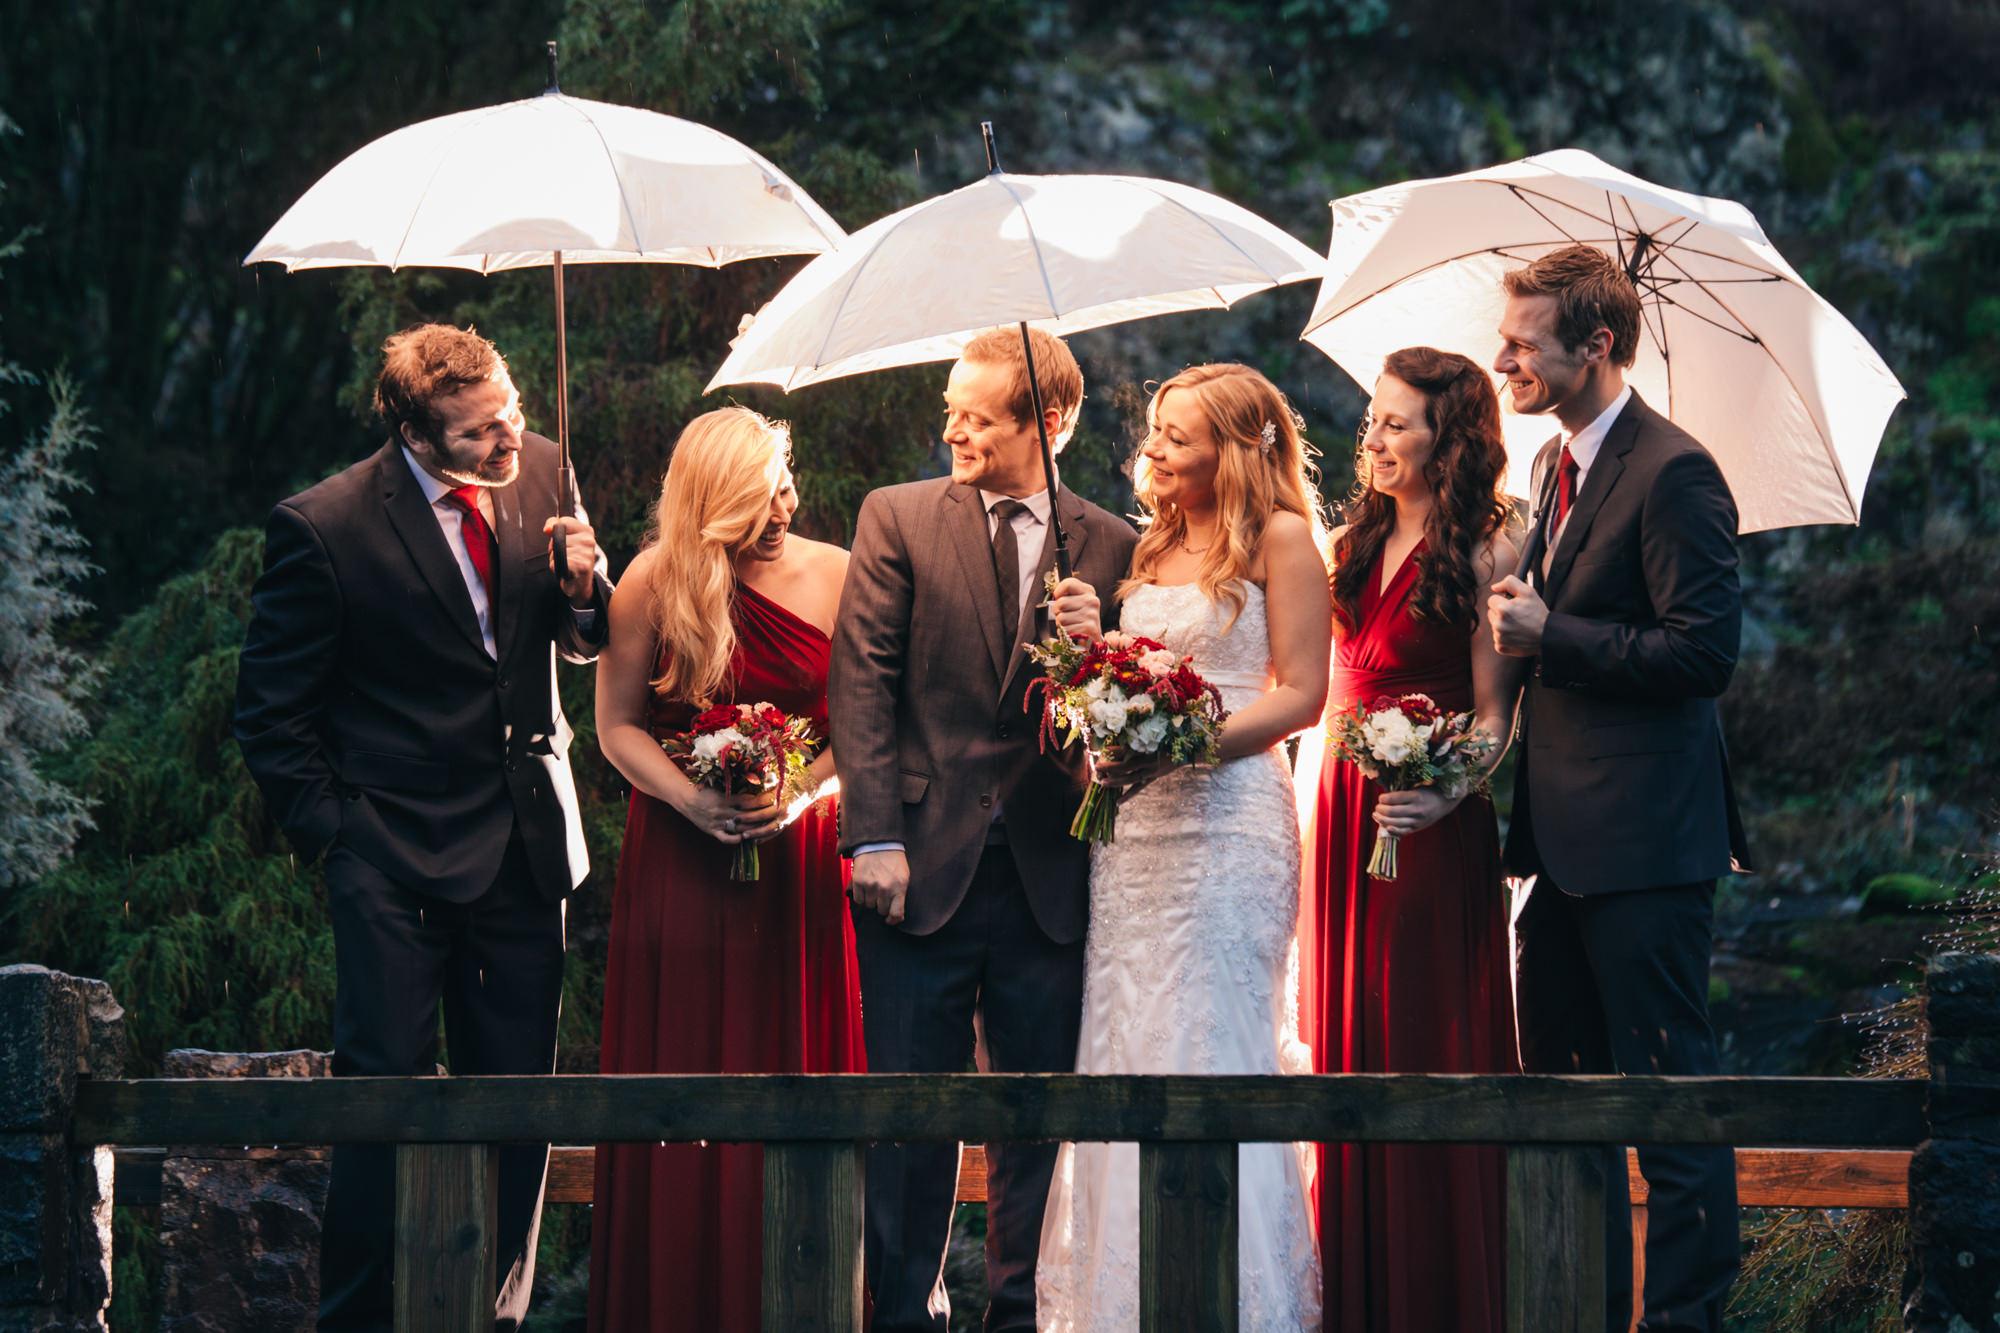 17-queen-elizabeth-park-wedding-party--qepark-umbrella.jpg